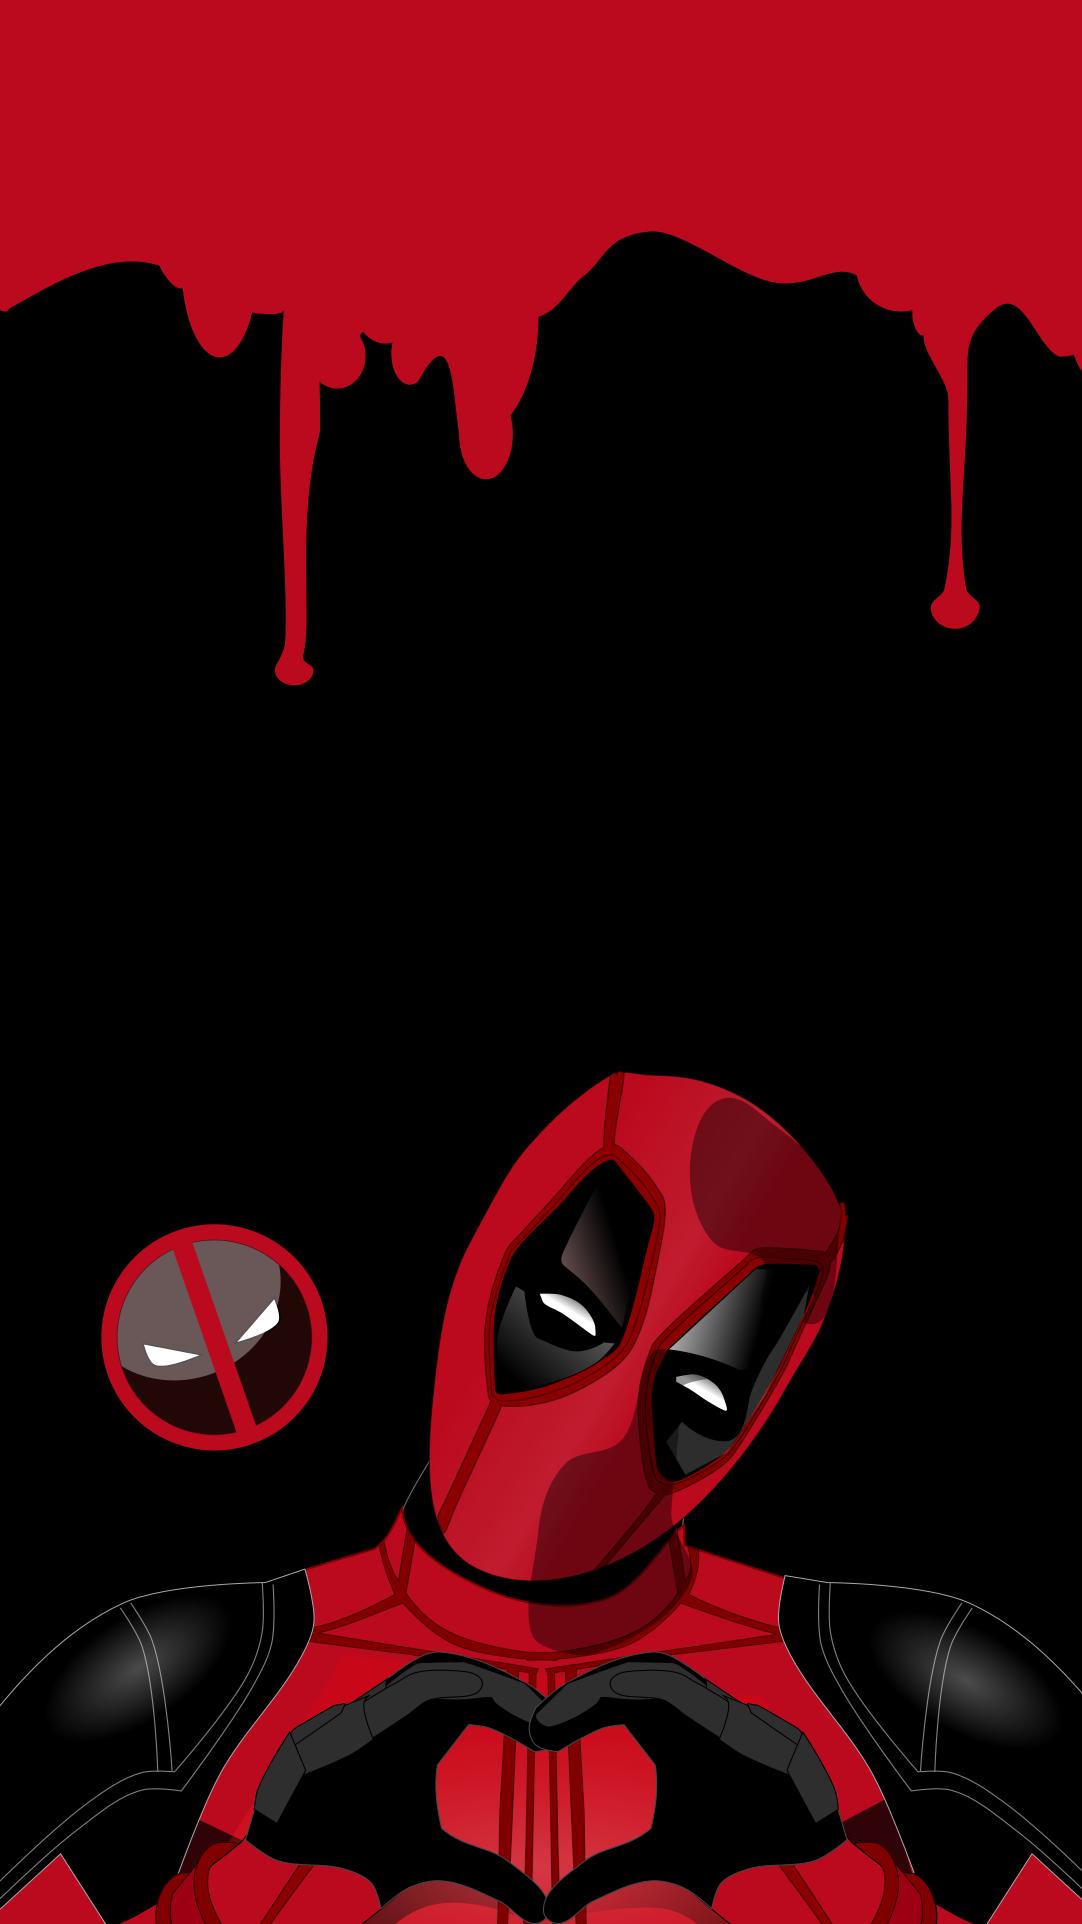 Deadpool Wallpapers Iphone 6 Kadada Org